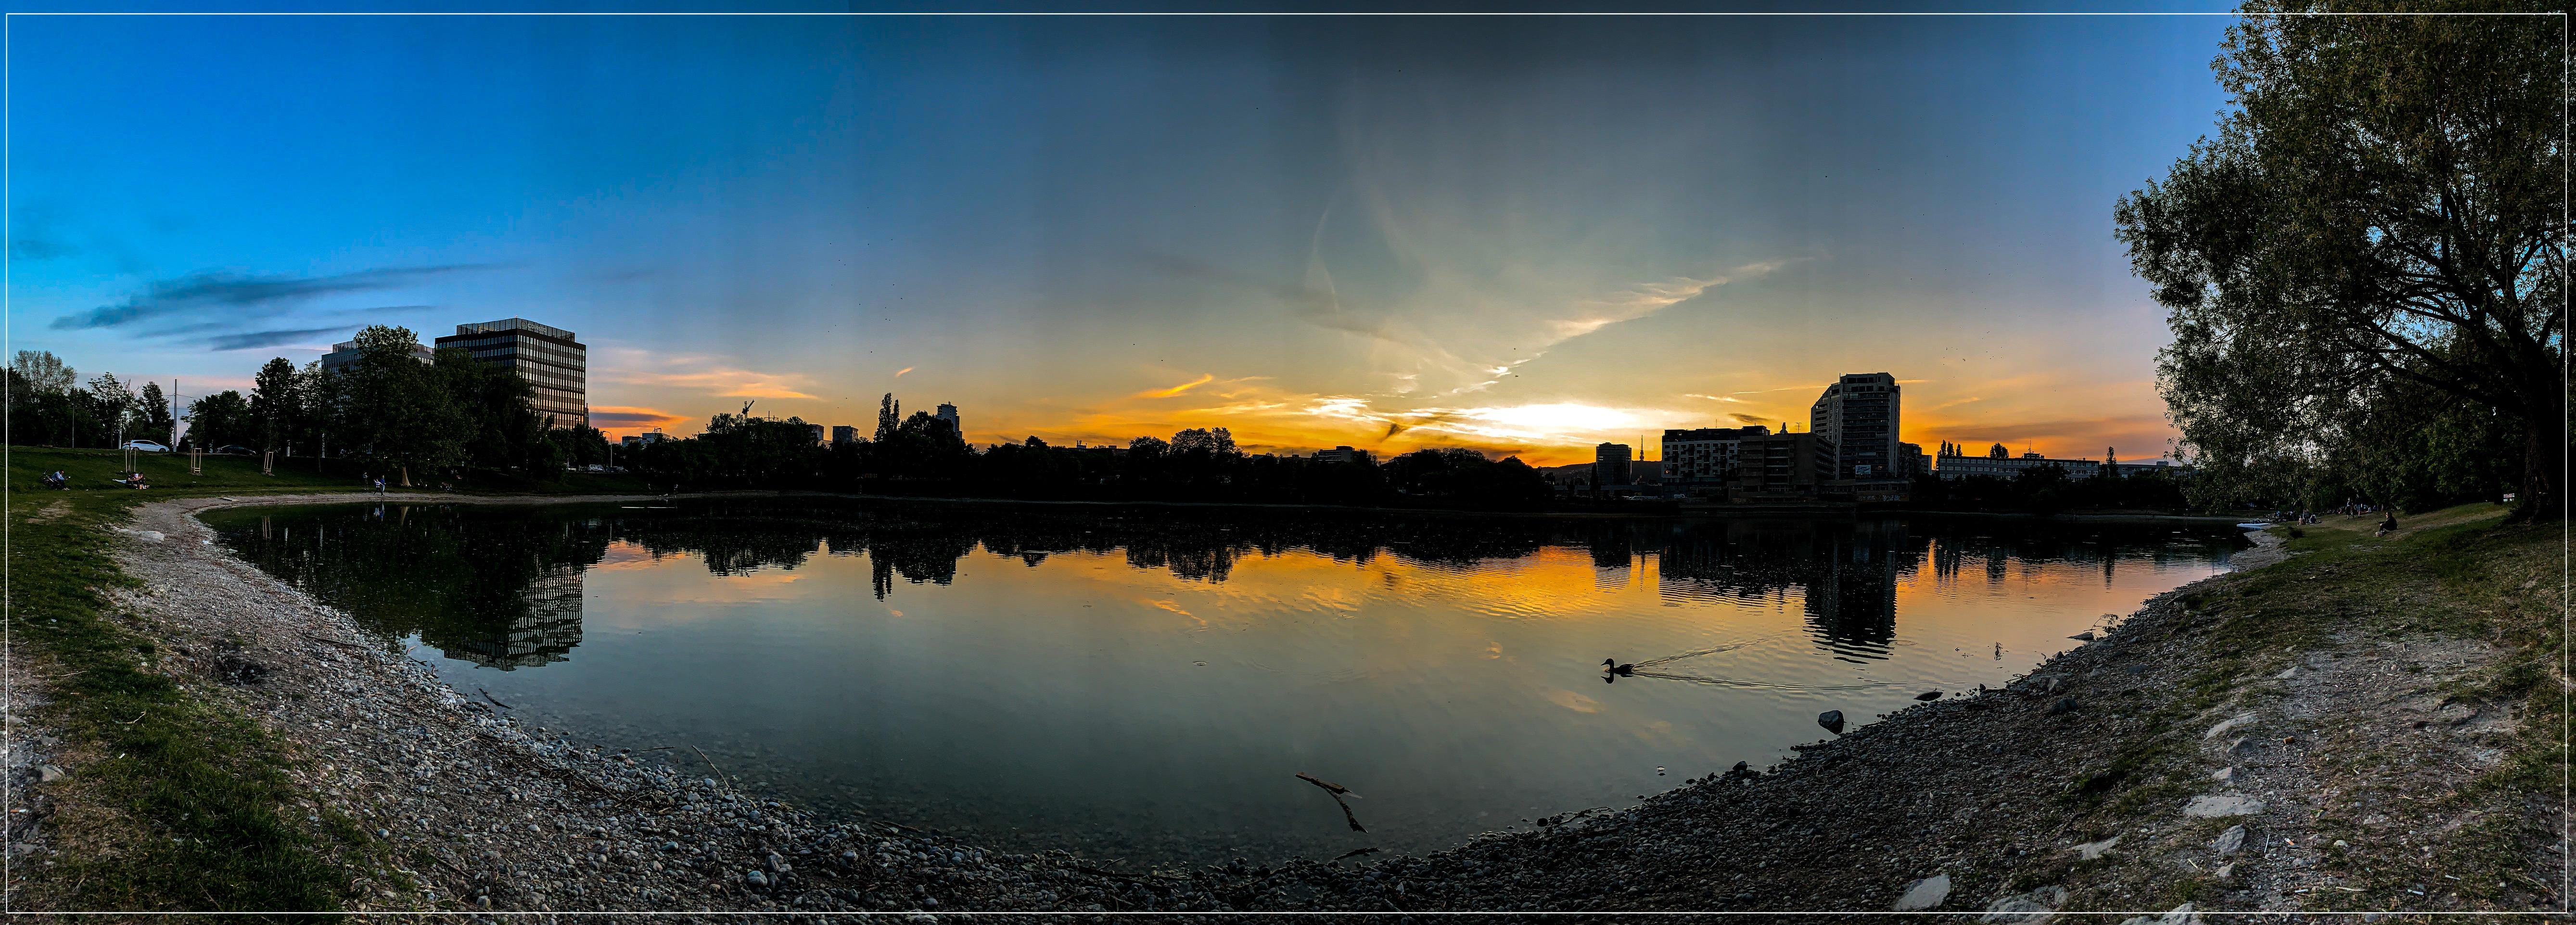 Zapad slnka Strkovec Ruzinov Bratislavajpg